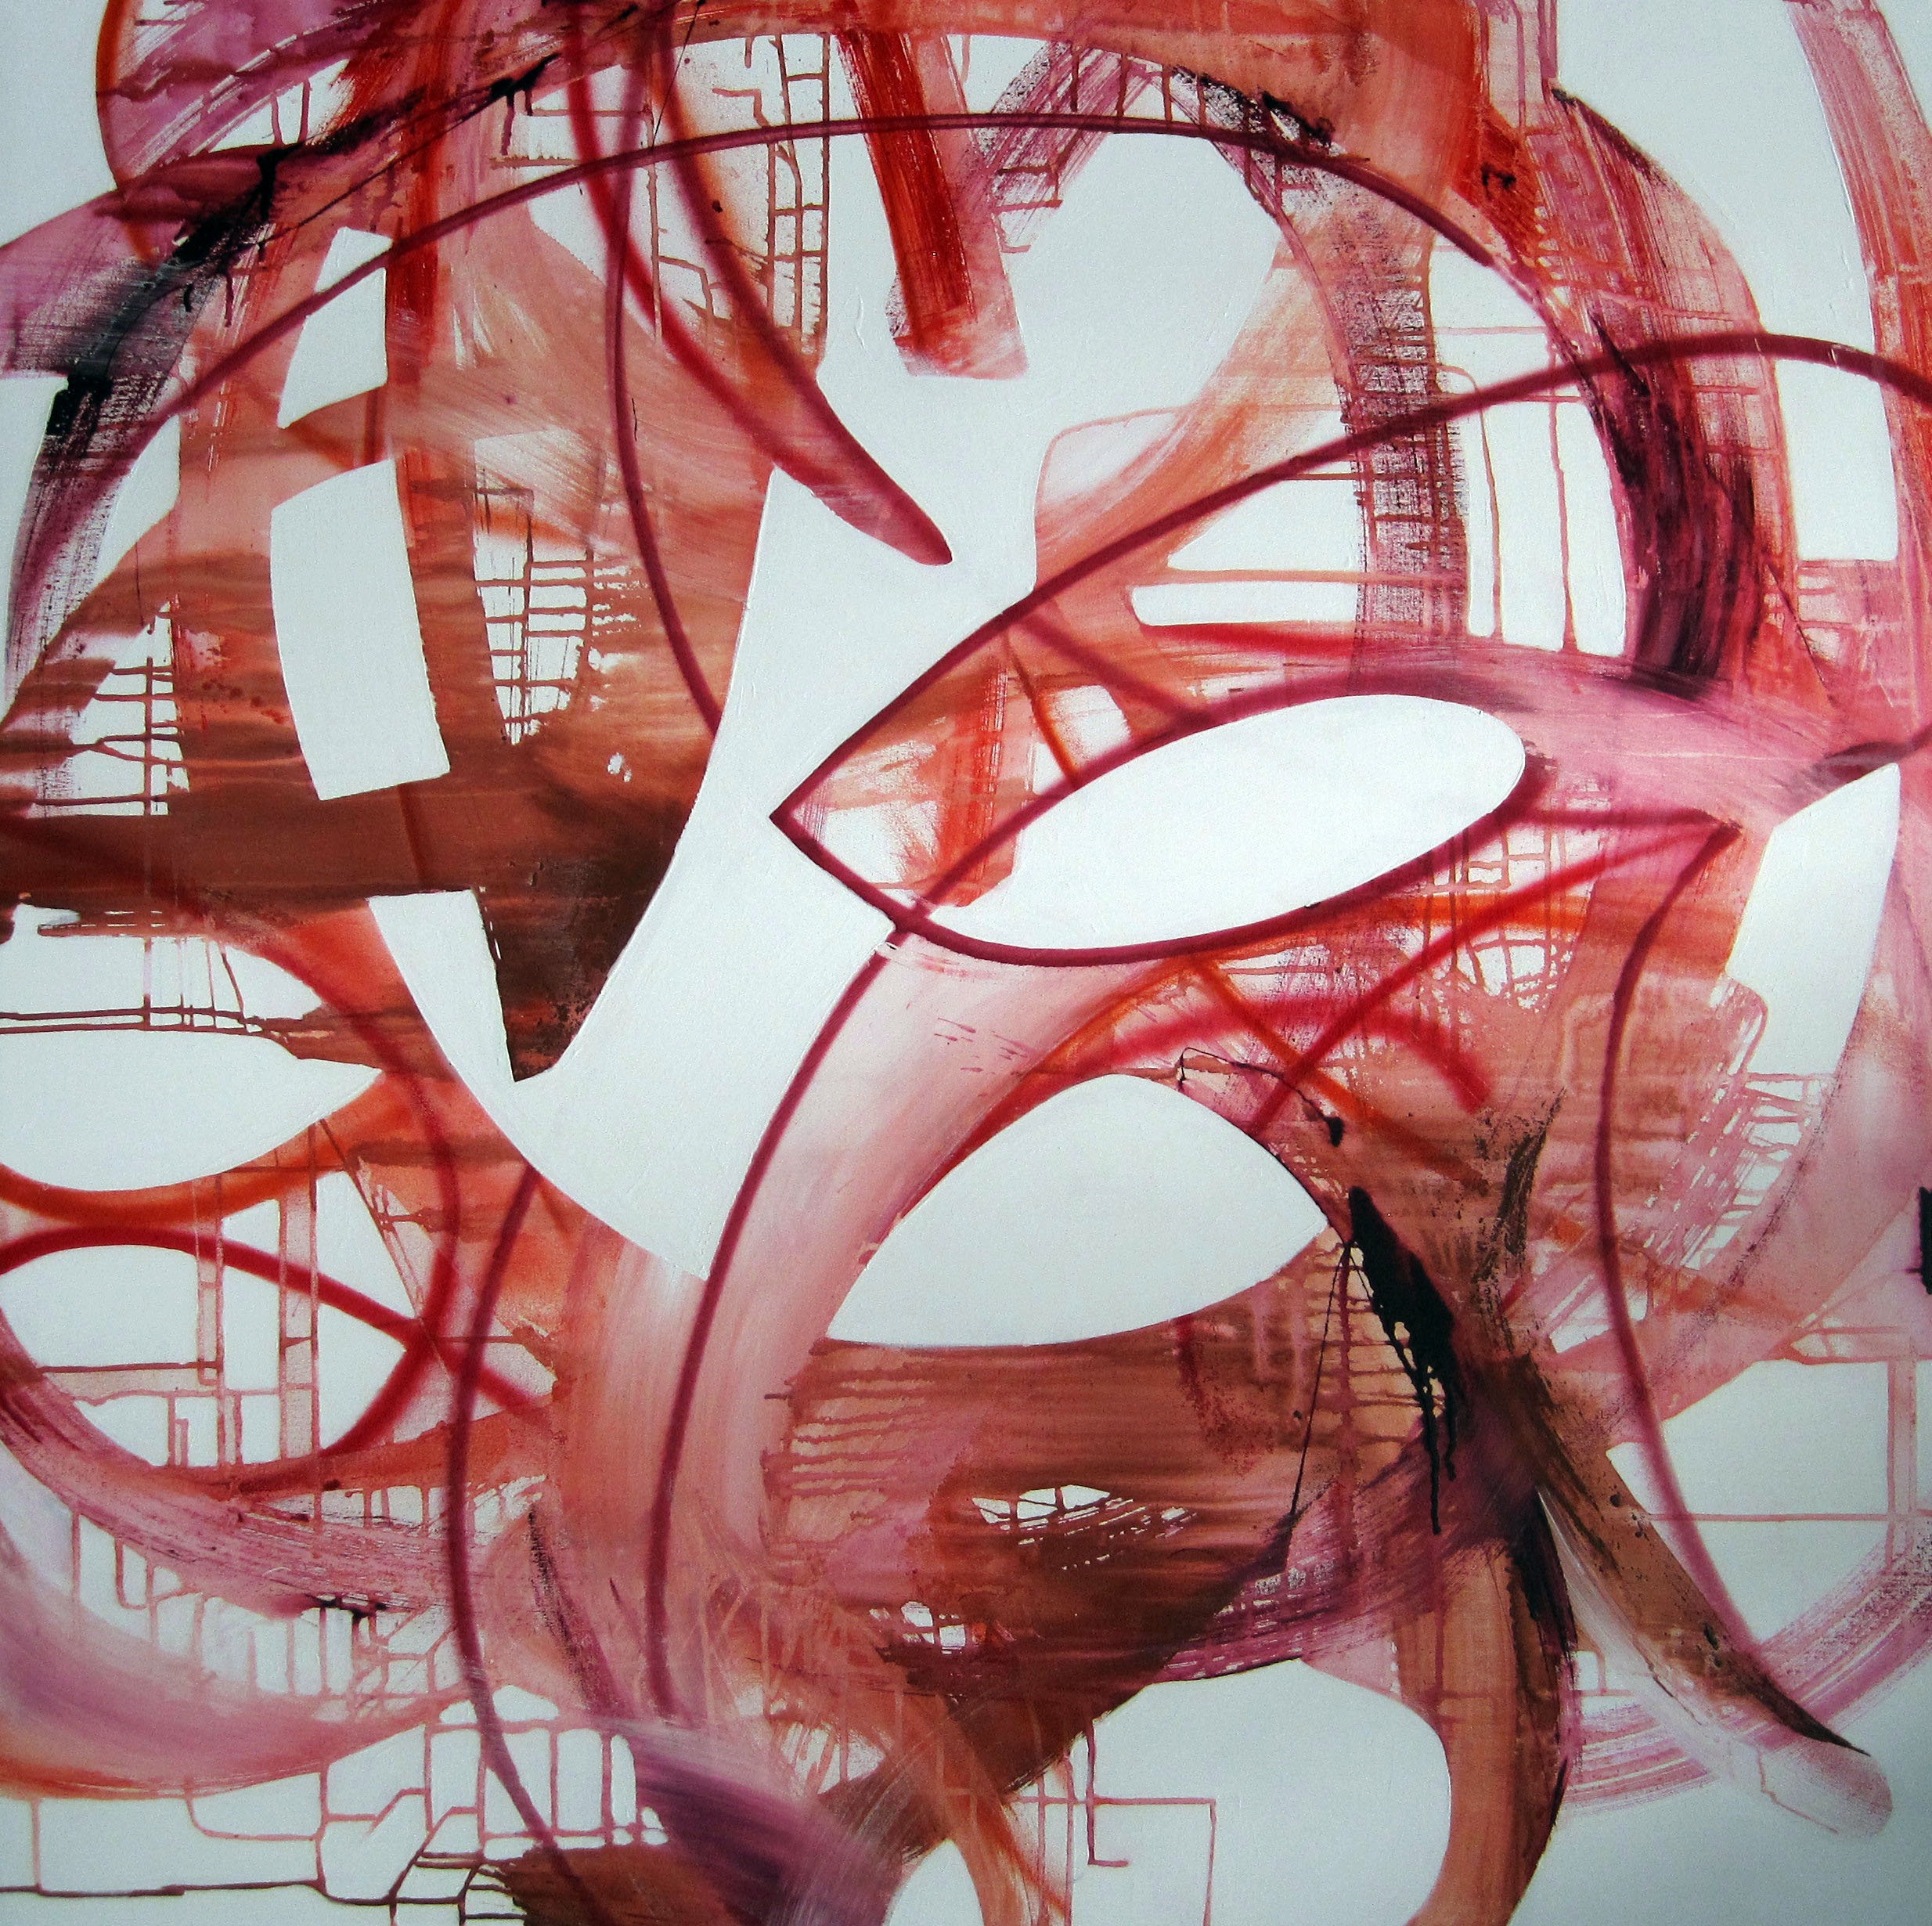 r-s1.acrylicspraypaintandpenciloncanvas.4.5ftx4.5ft.jpg